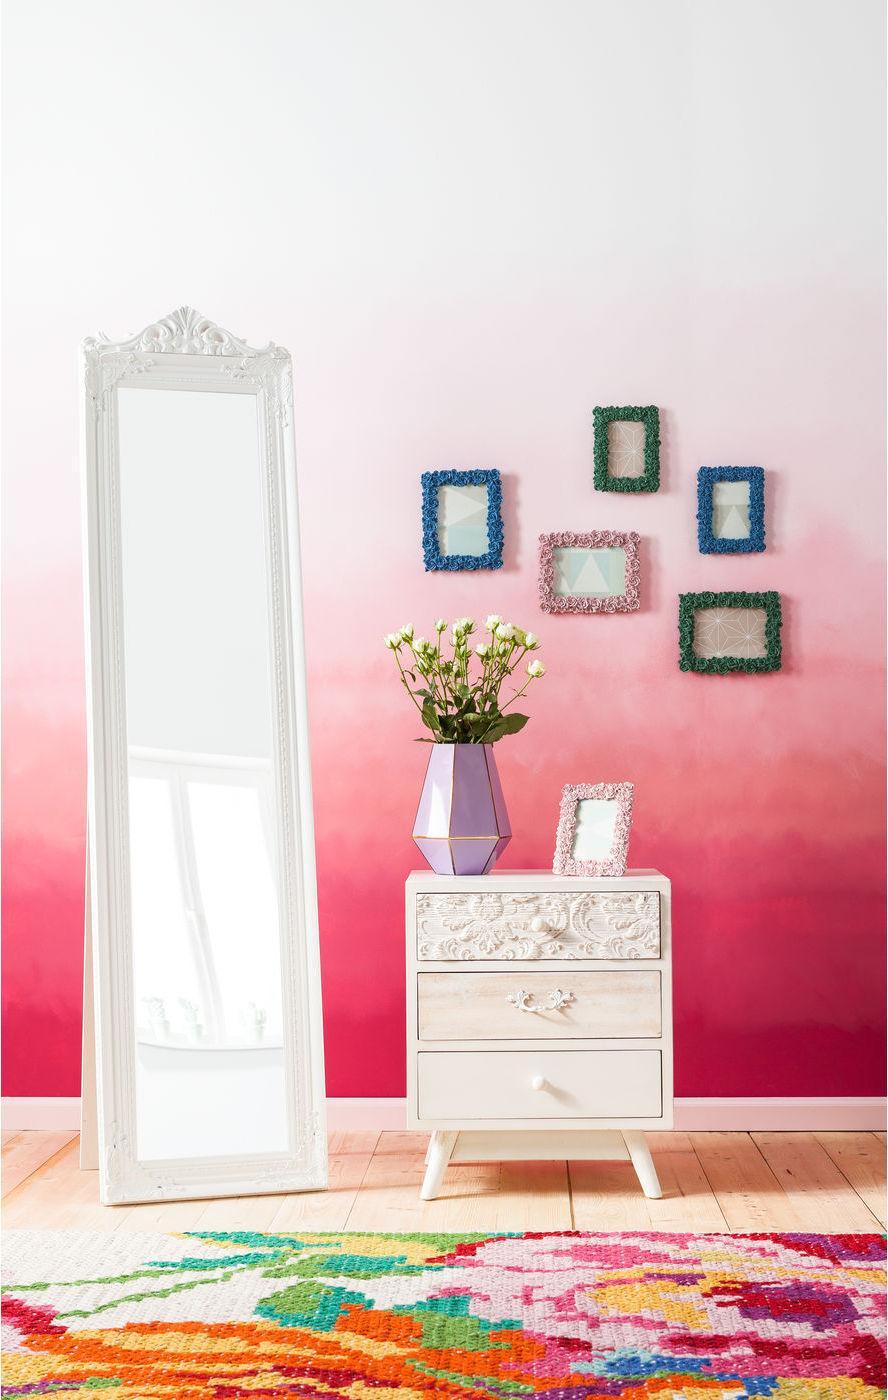 kare design staande spiegel baroque wit 180 cm meubelen verlichting. Black Bedroom Furniture Sets. Home Design Ideas